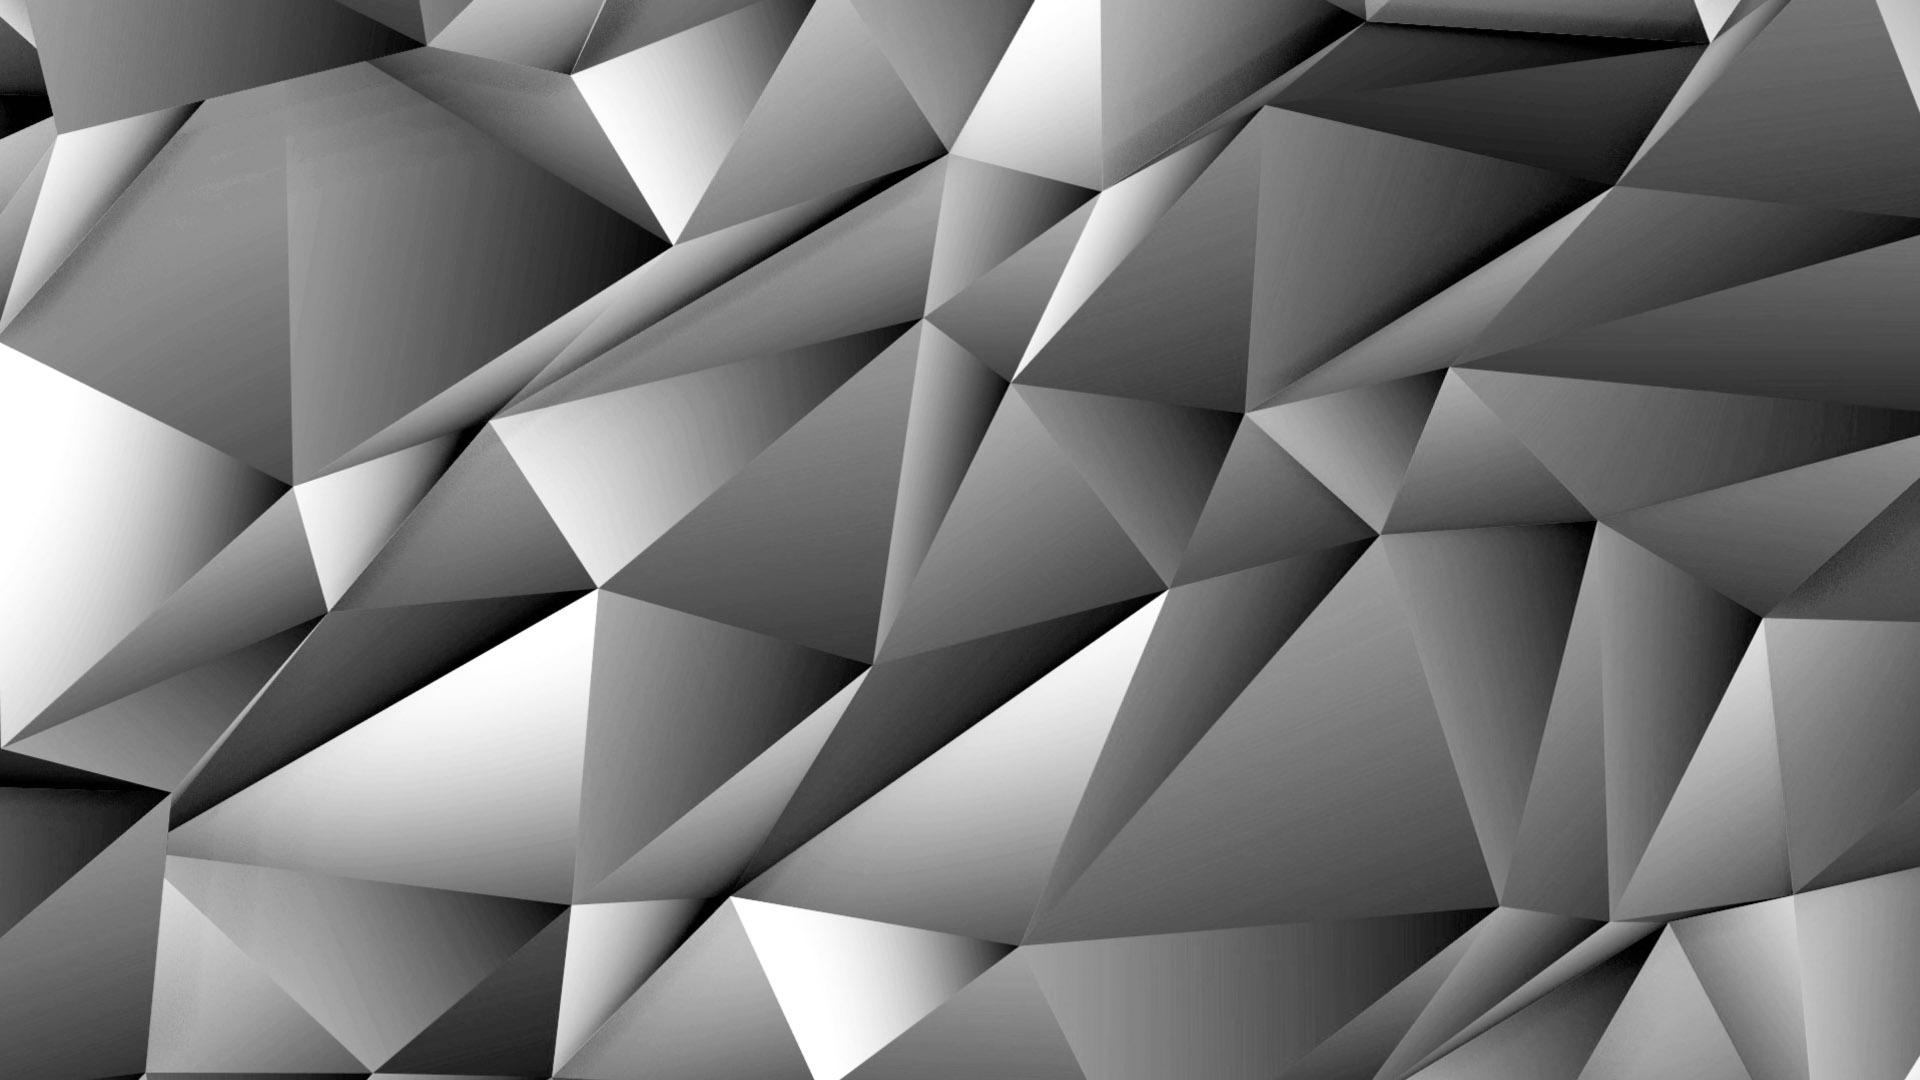 monochrome motion backgrounds